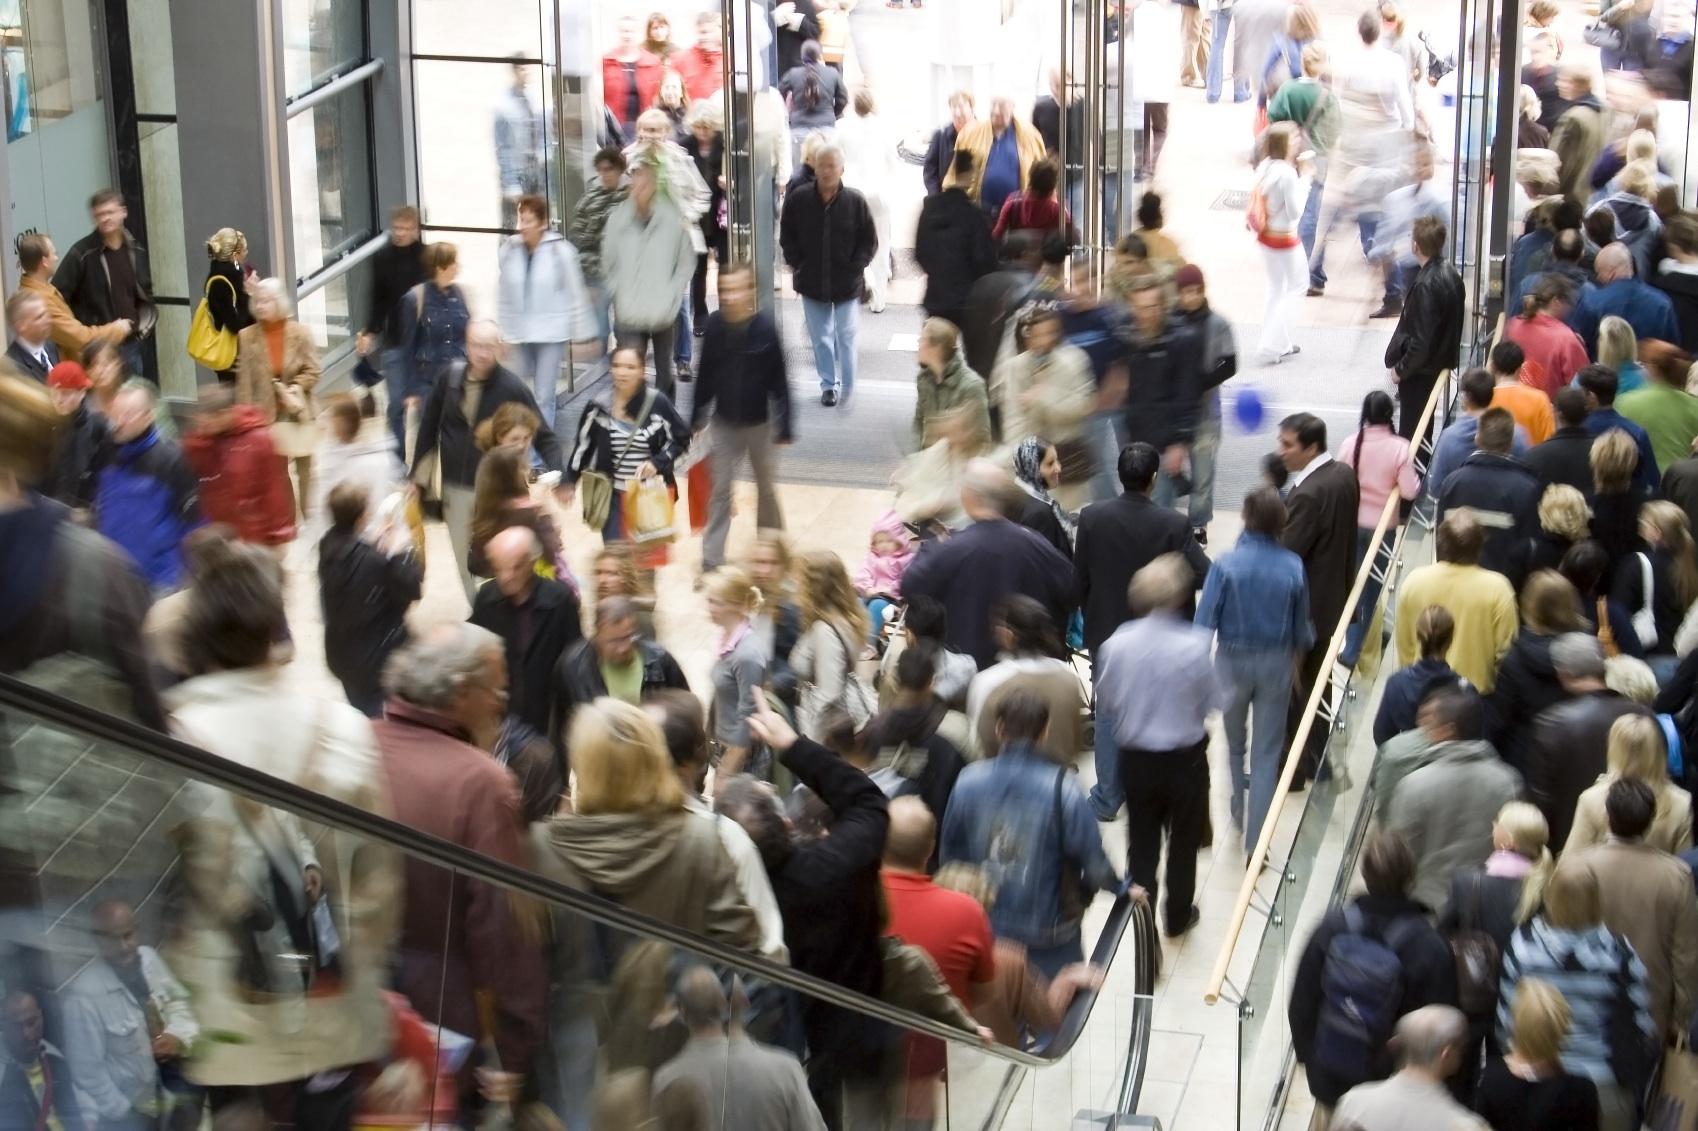 Crowd escalator